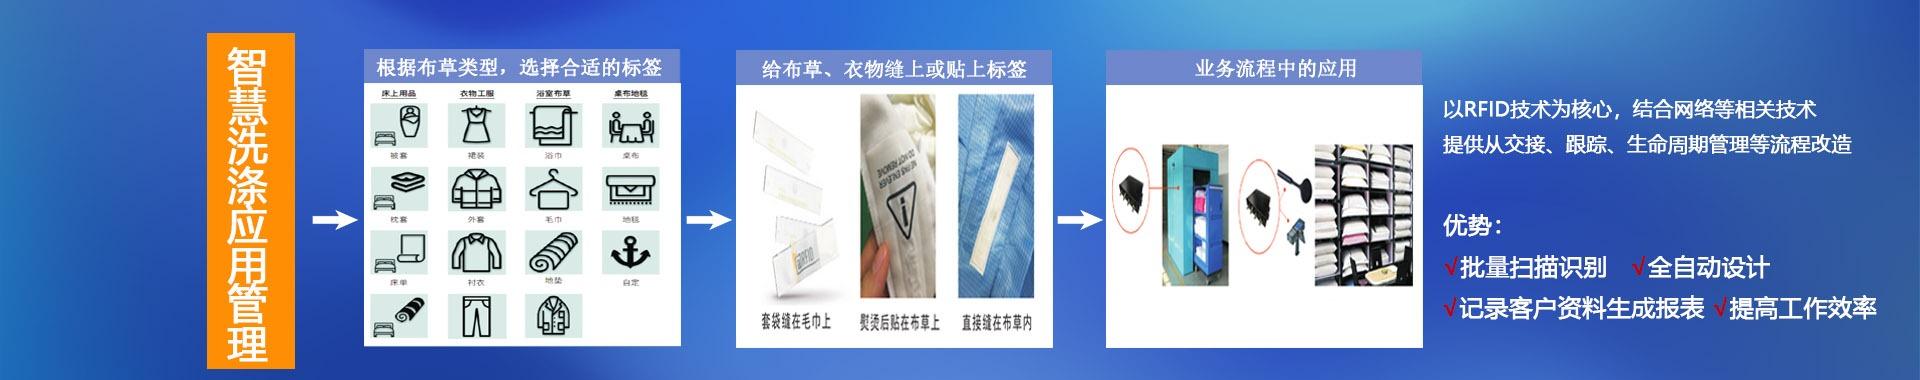 RFID智能制造